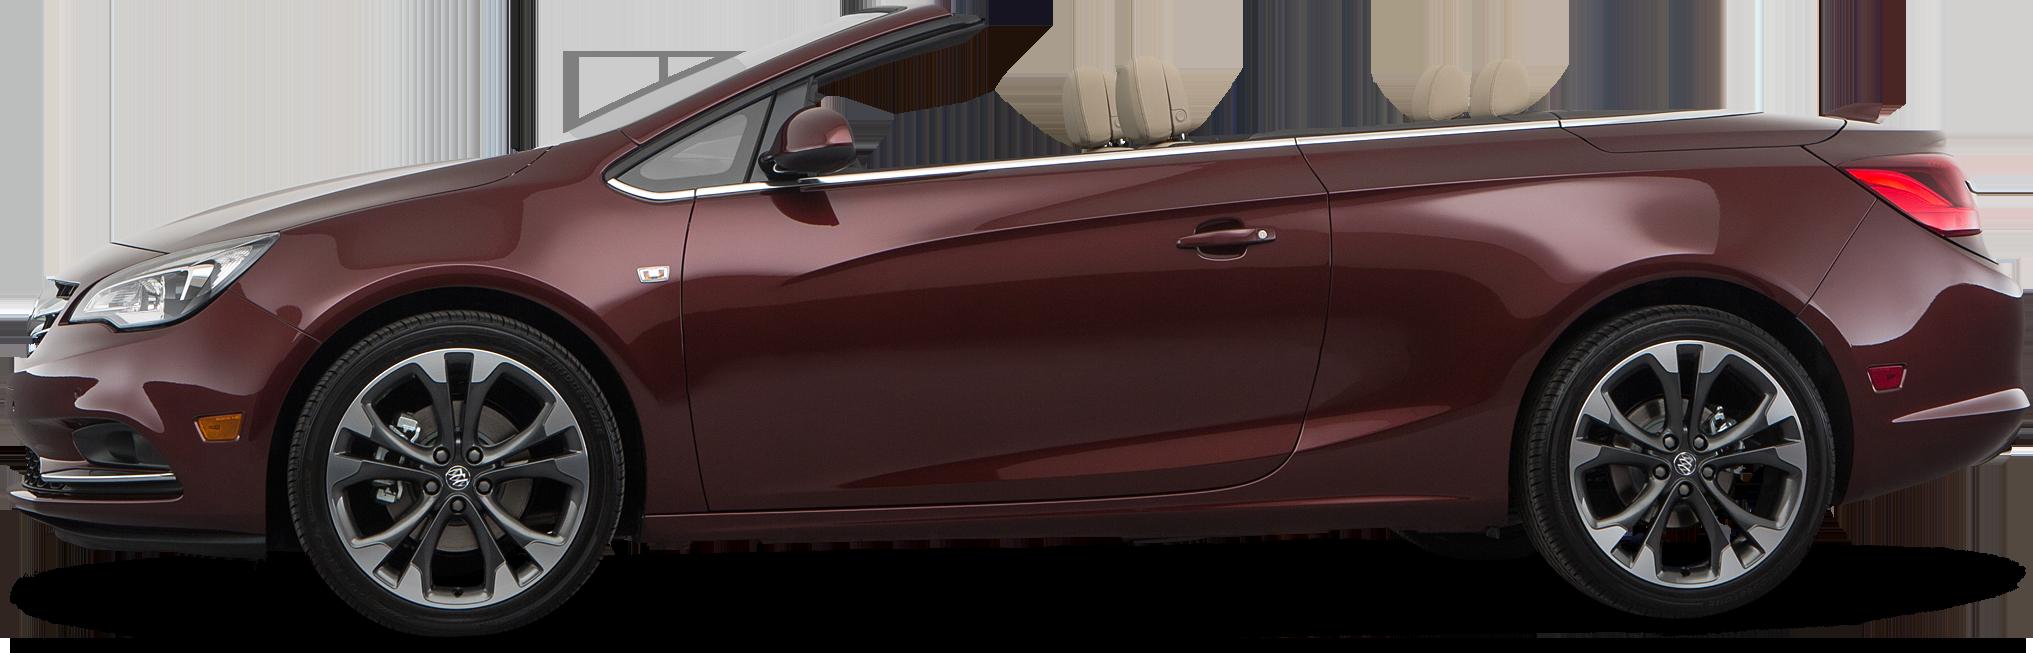 2019 Buick Cascada Convertible Premium